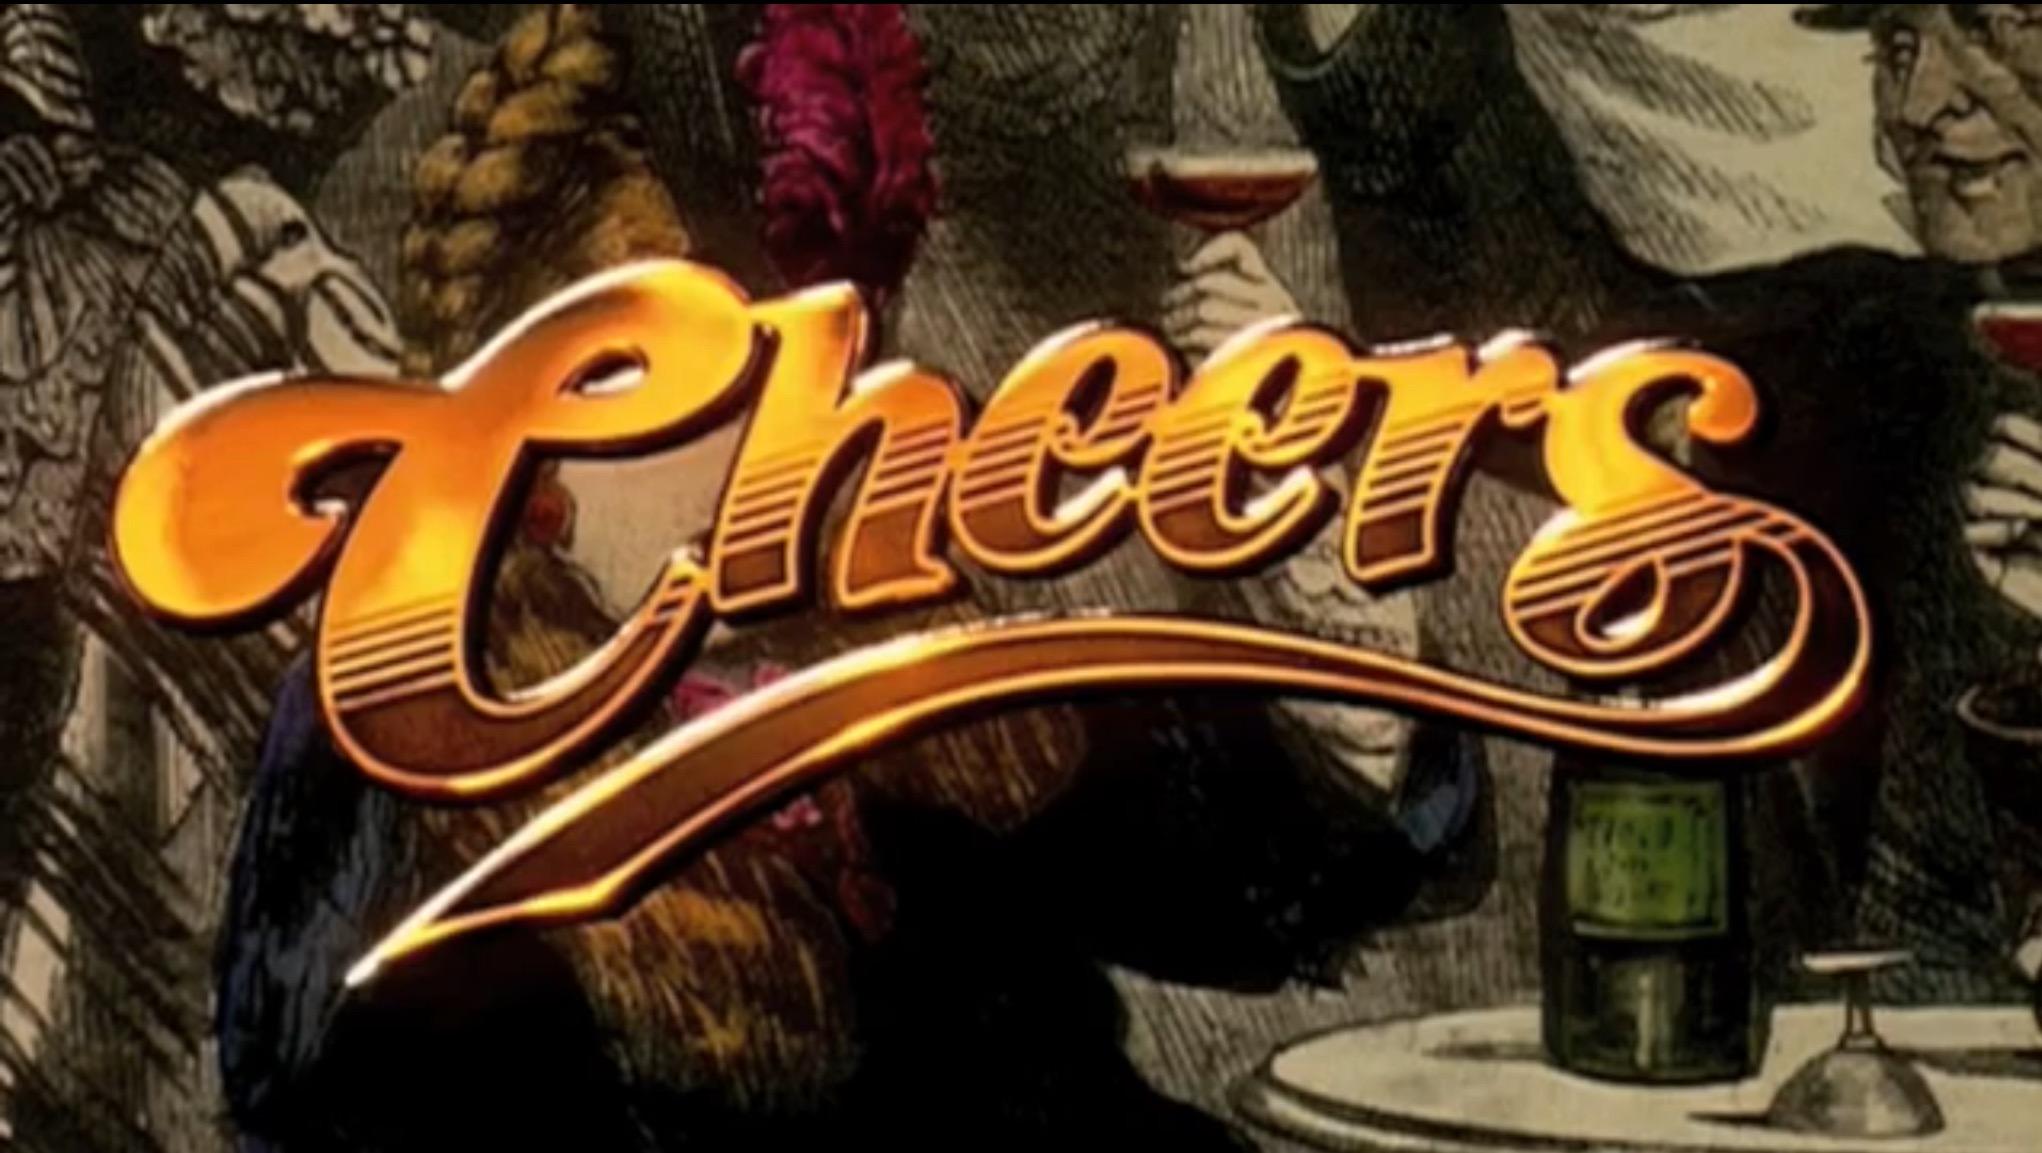 Cheers TV titles Screen shot